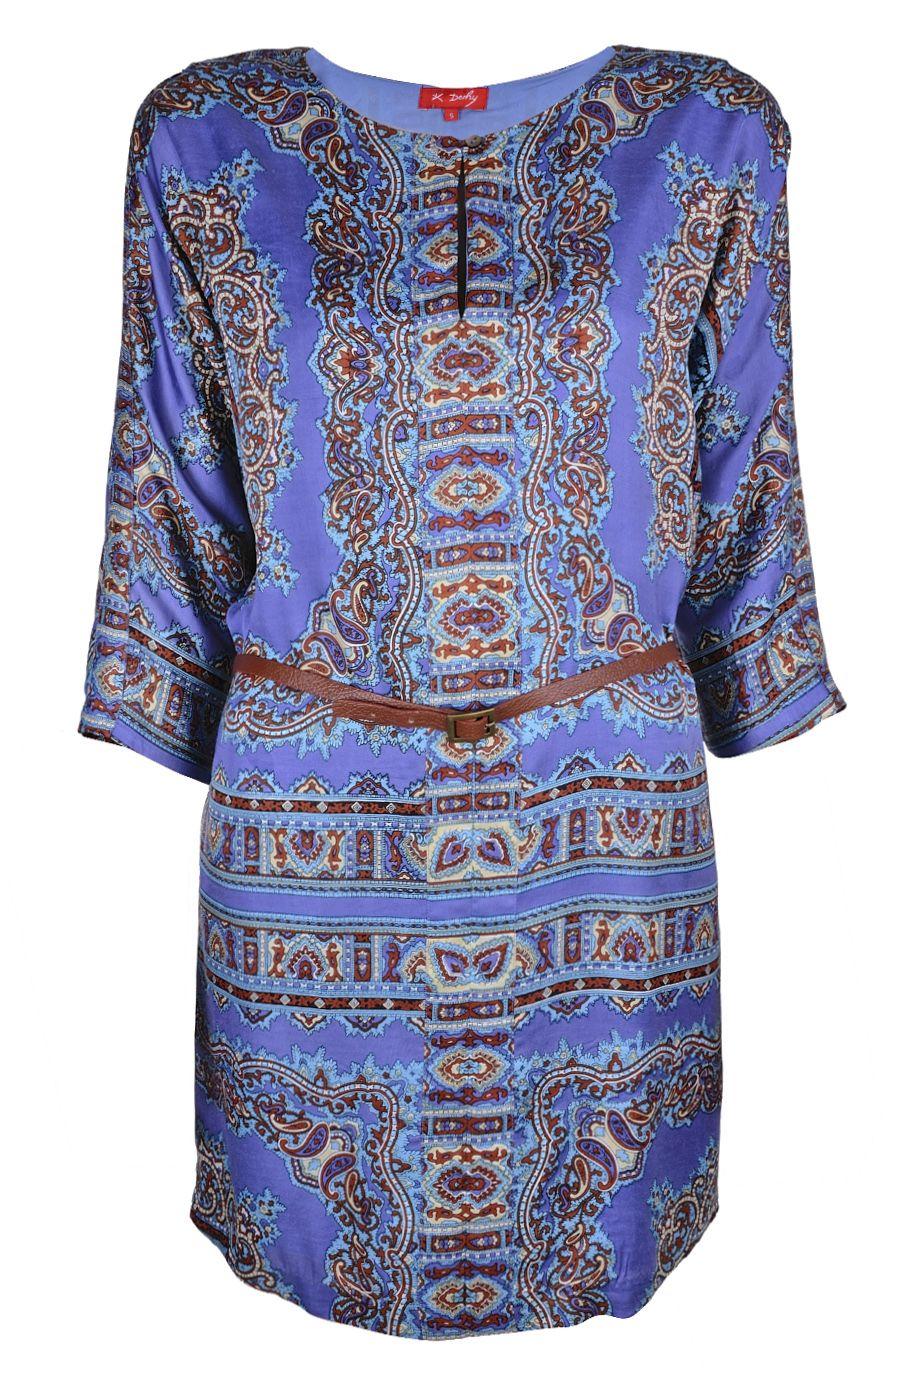 RENÉ DERHY  AGRAIRE Printed Viscose Dress